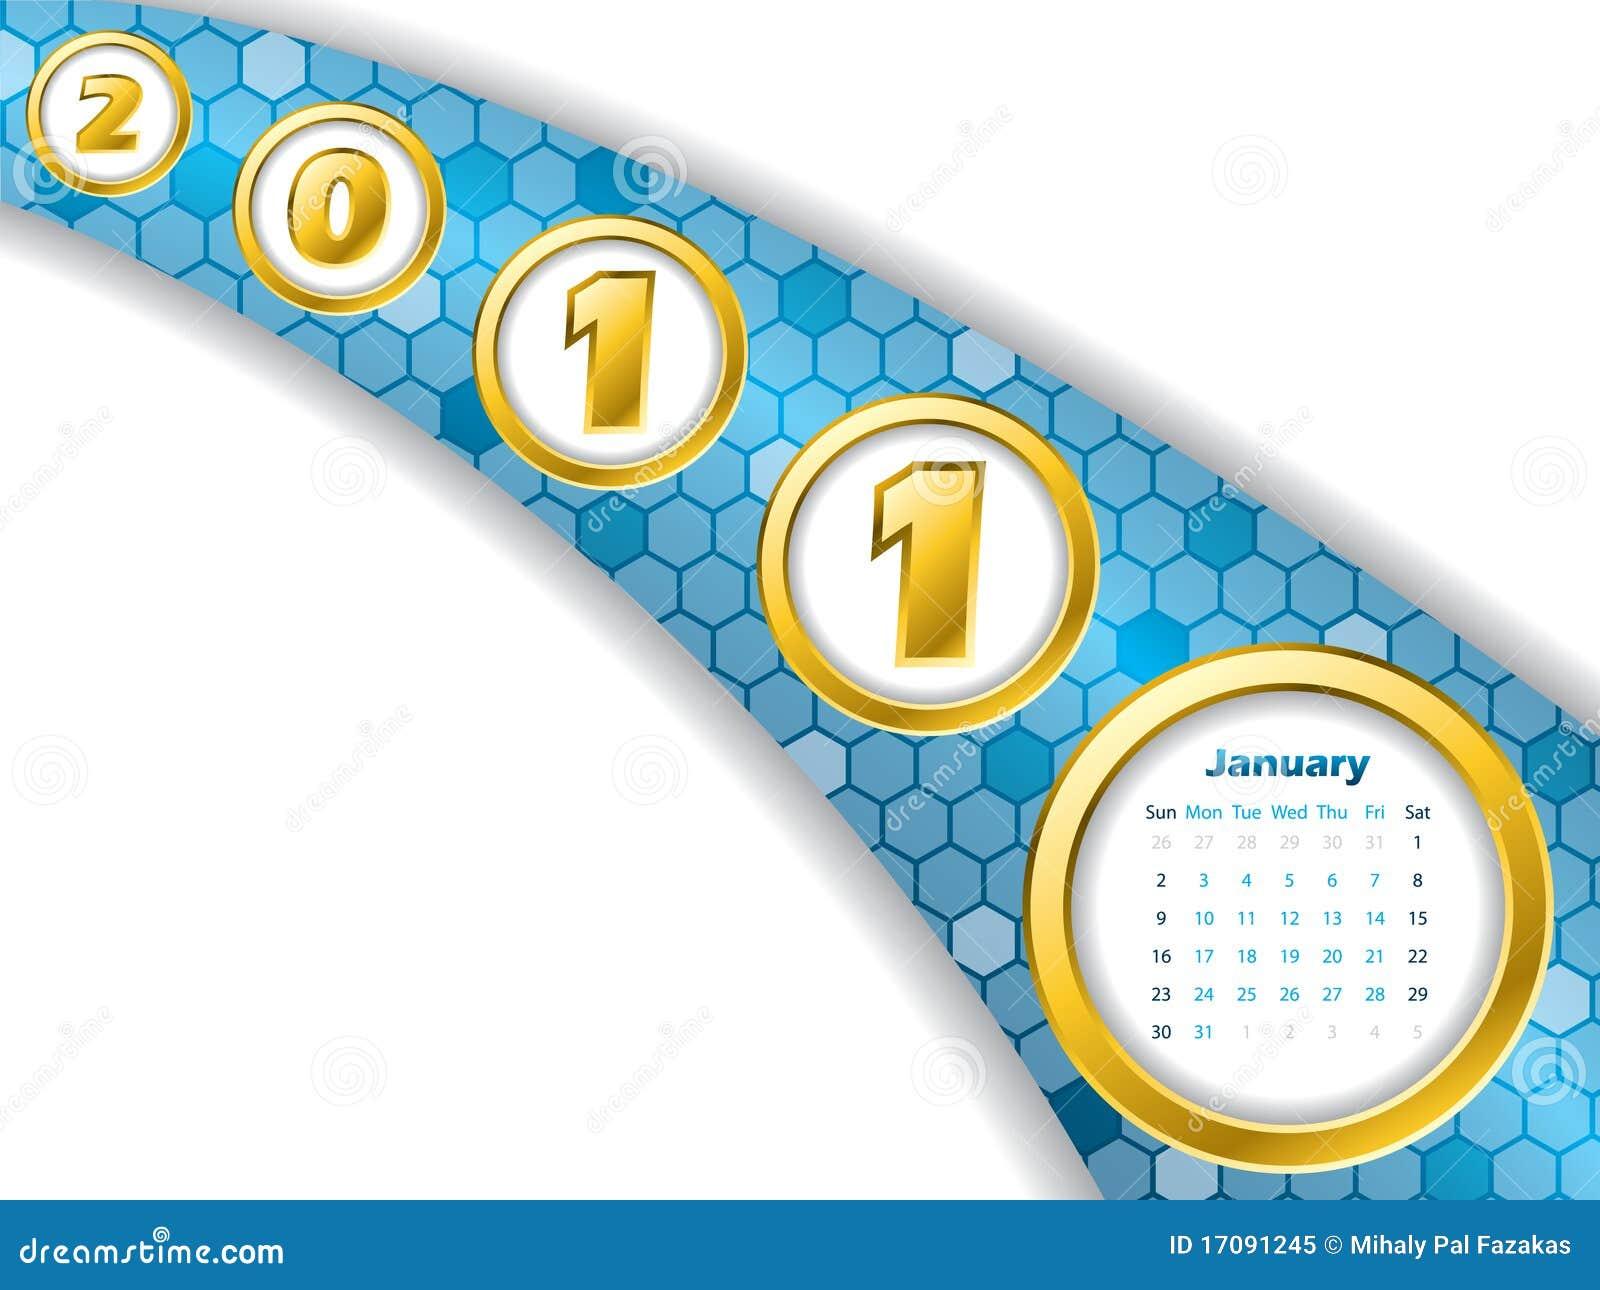 Streifenkalender Januar-2011